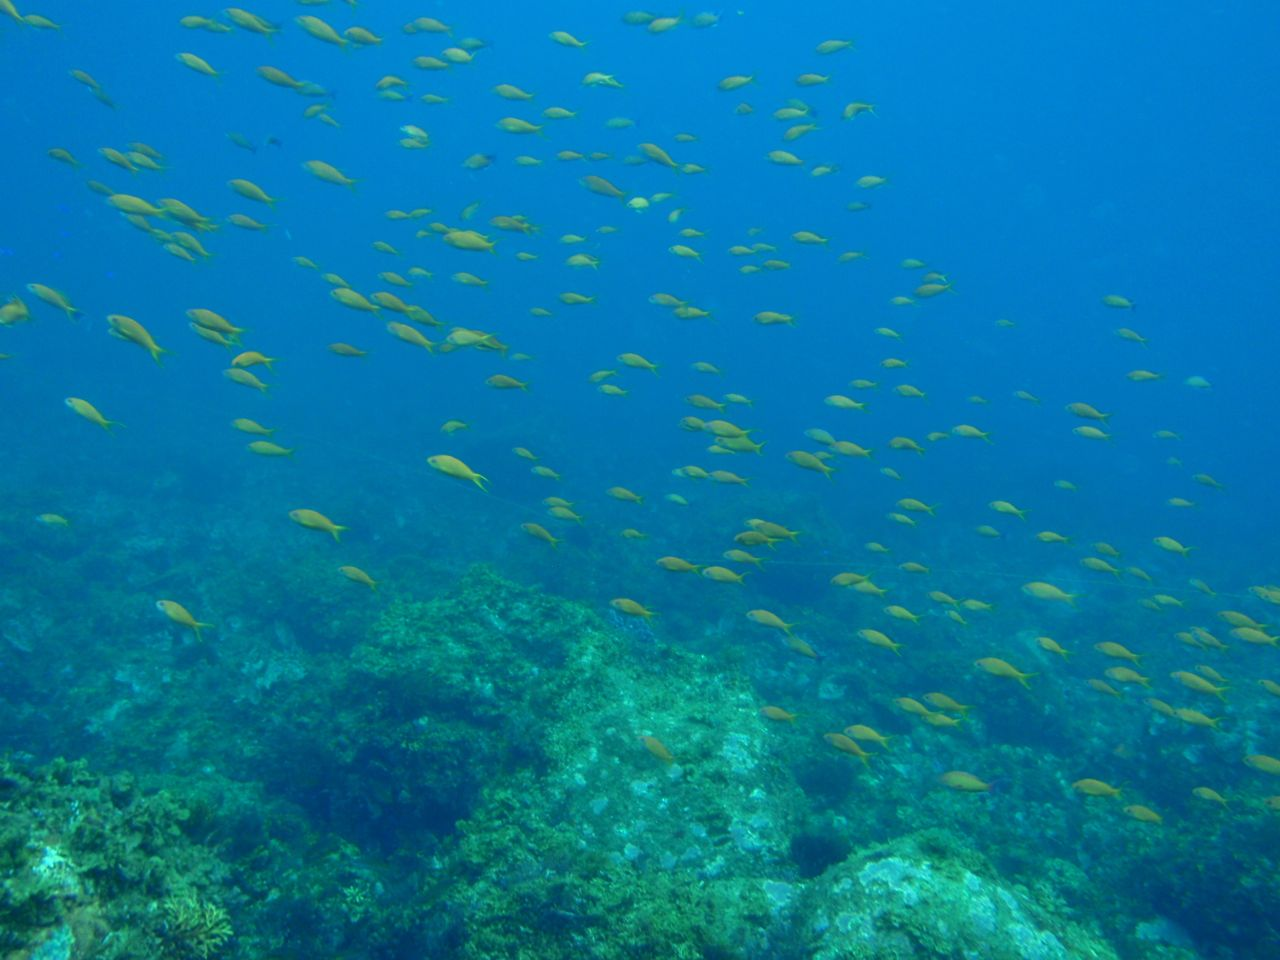 http://www.aquamarine-dive.net/blog/index.html/2014/08/07/P8233203.jpg